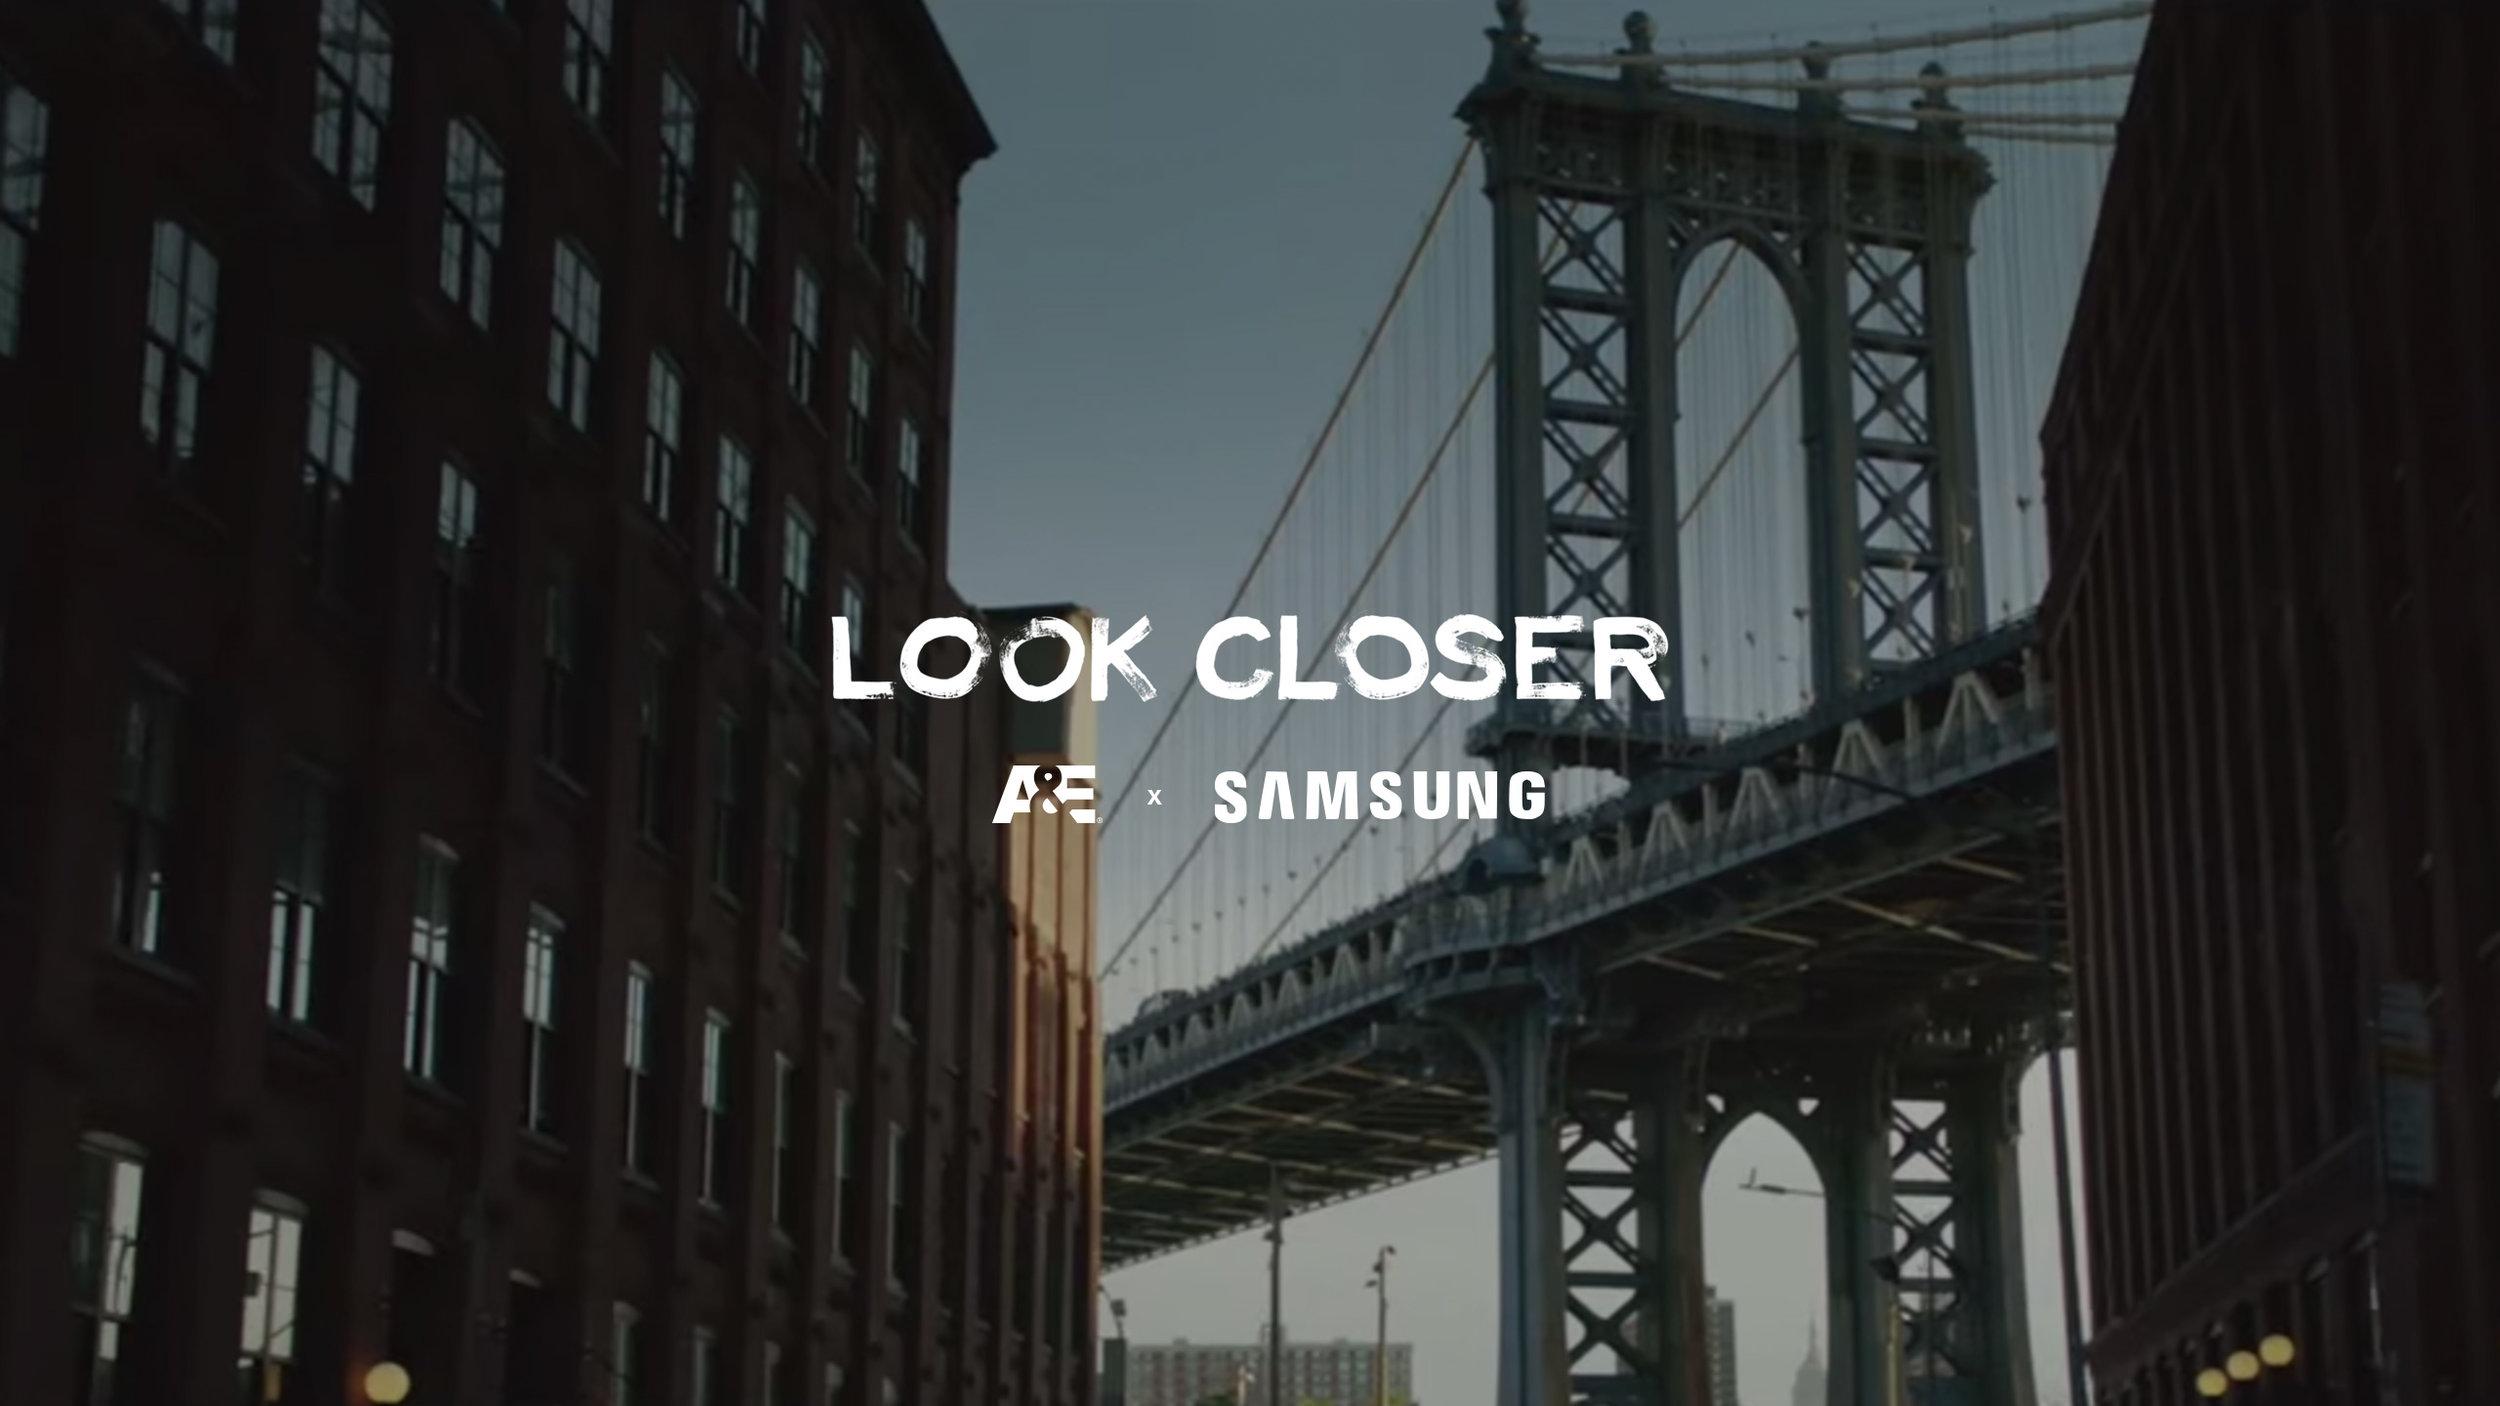 lookcloser2.jpg